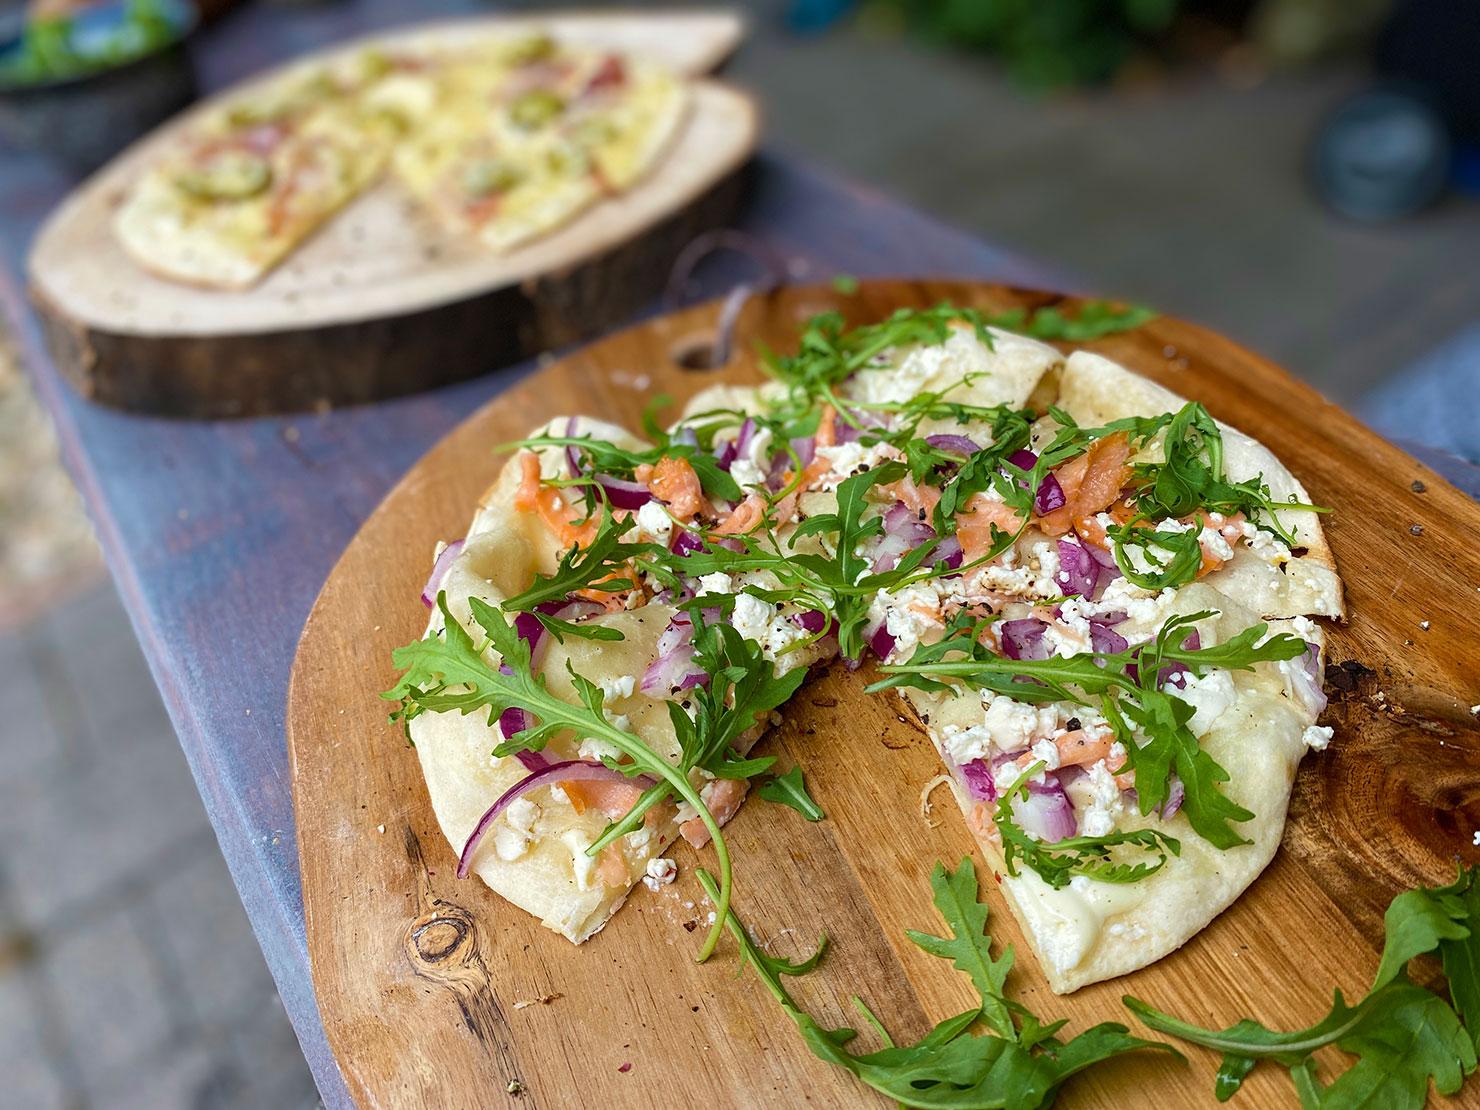 Flammkuchen de Duitse variant van de pizza